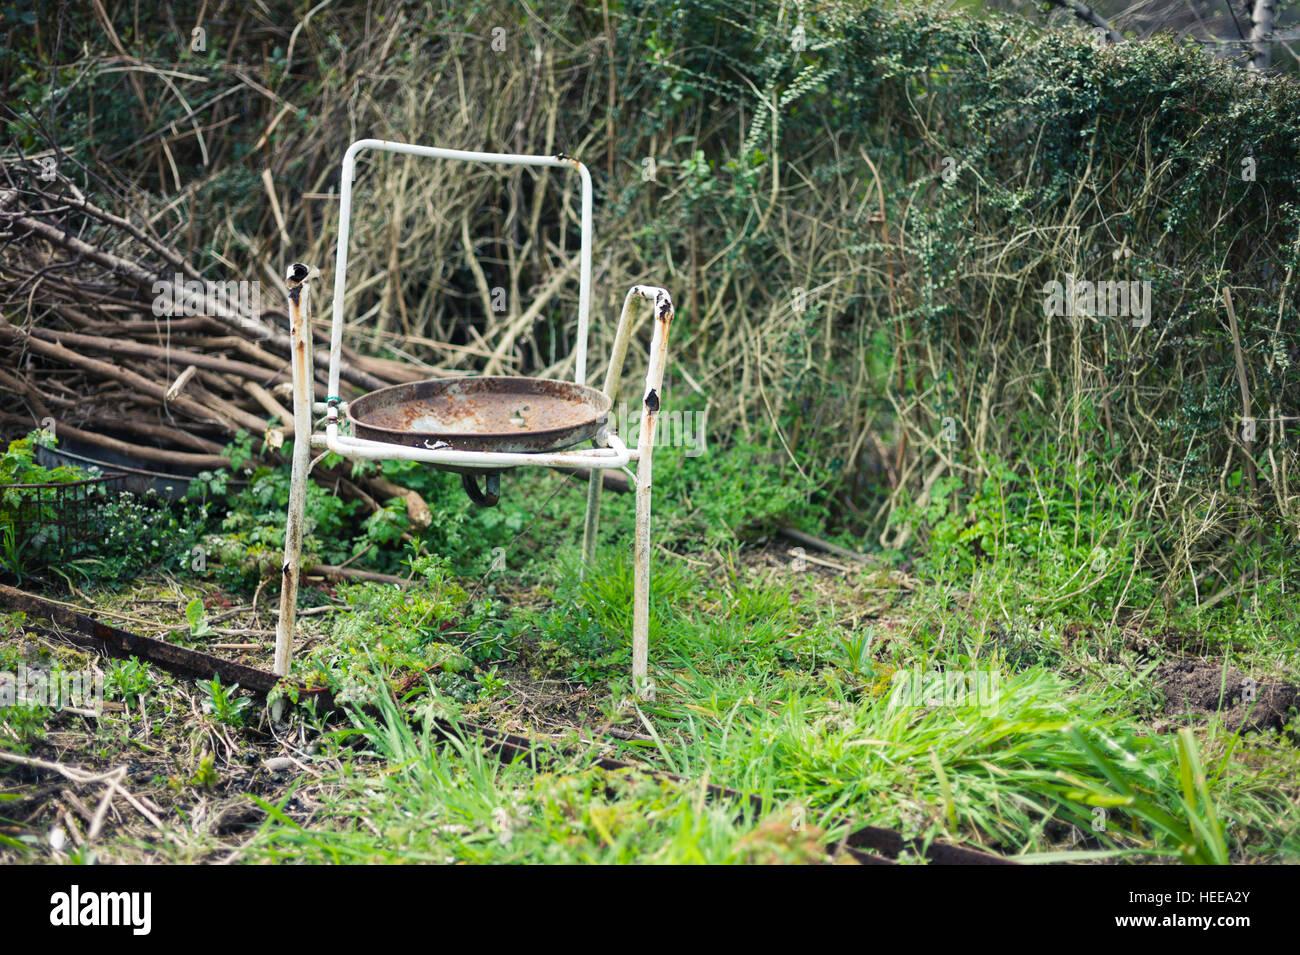 An Old Broken Chair In Overgrown Garden